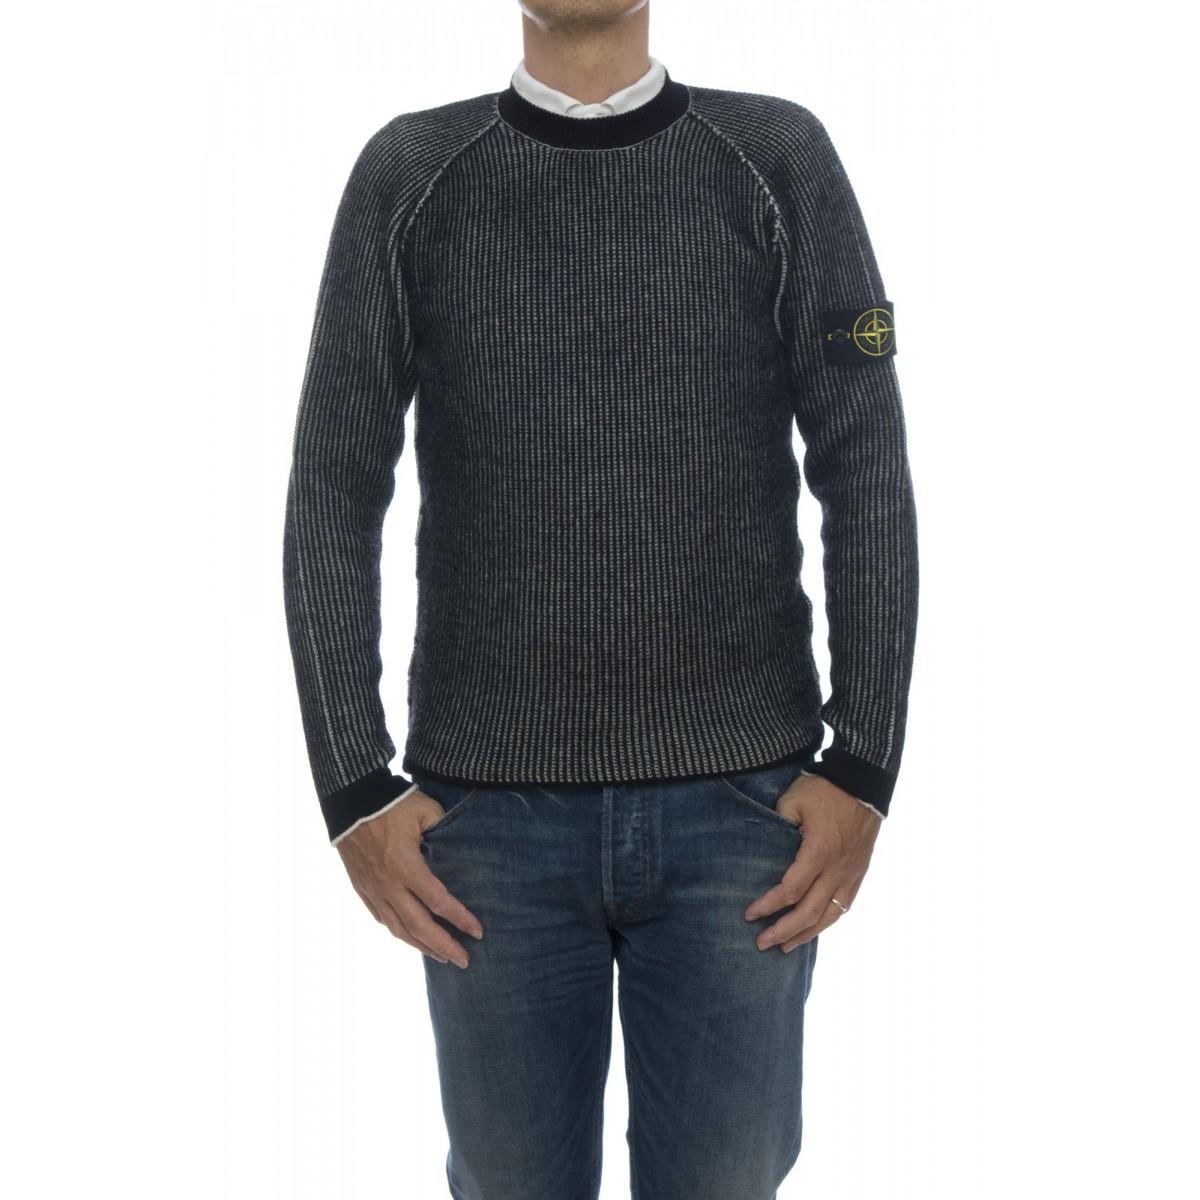 Men Sweater - 580D1 reversible 34% wool, 34% polyamid, 22% acrilyc, 8% alpaca